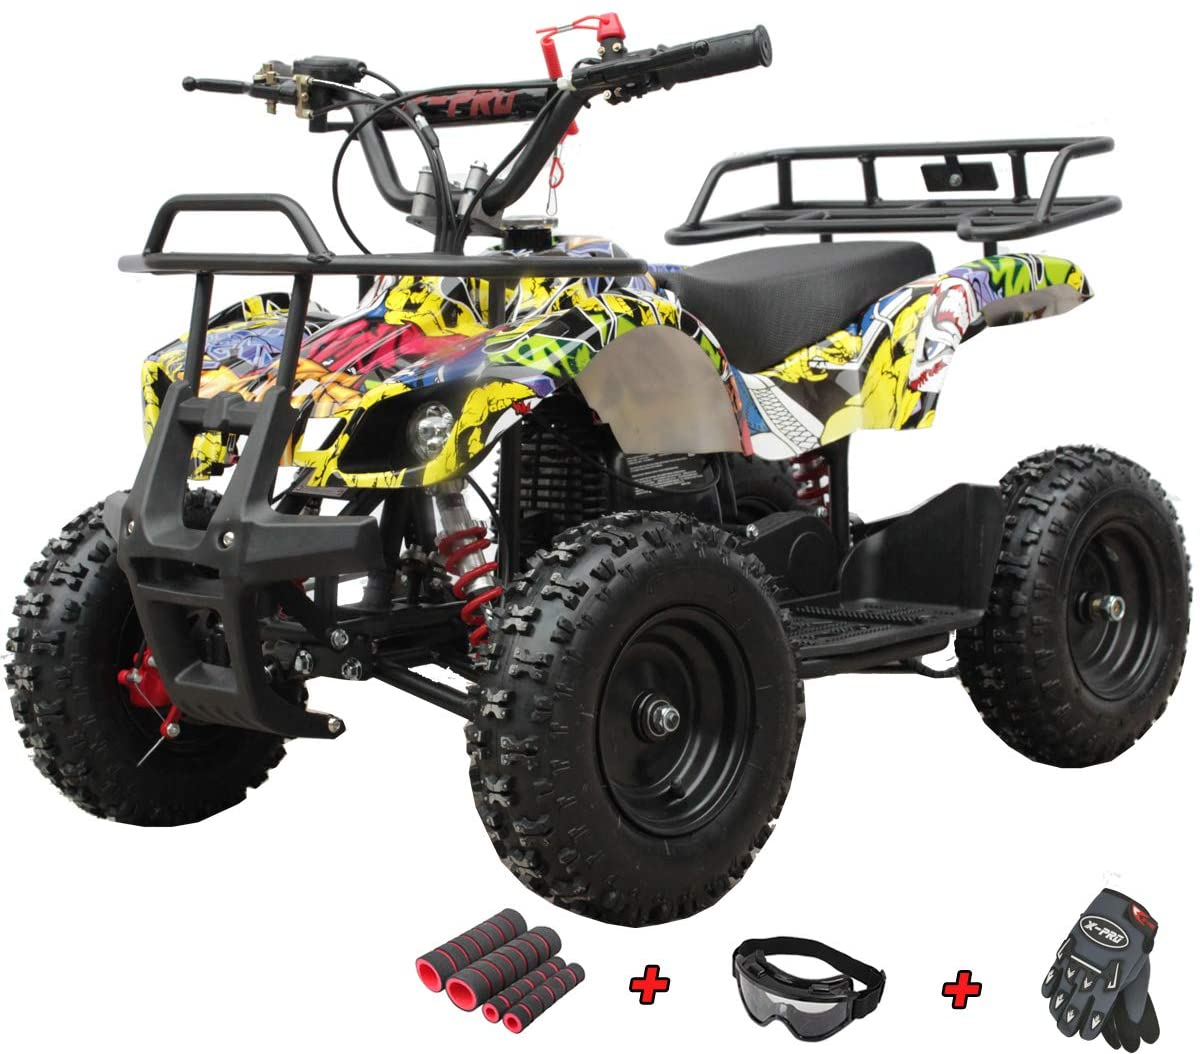 X-PRO Kids ATV 4 Wheelers 40cc ATV Quads Kids Quad with Gloves, Goggle and Handgrip (Hip-Hop)